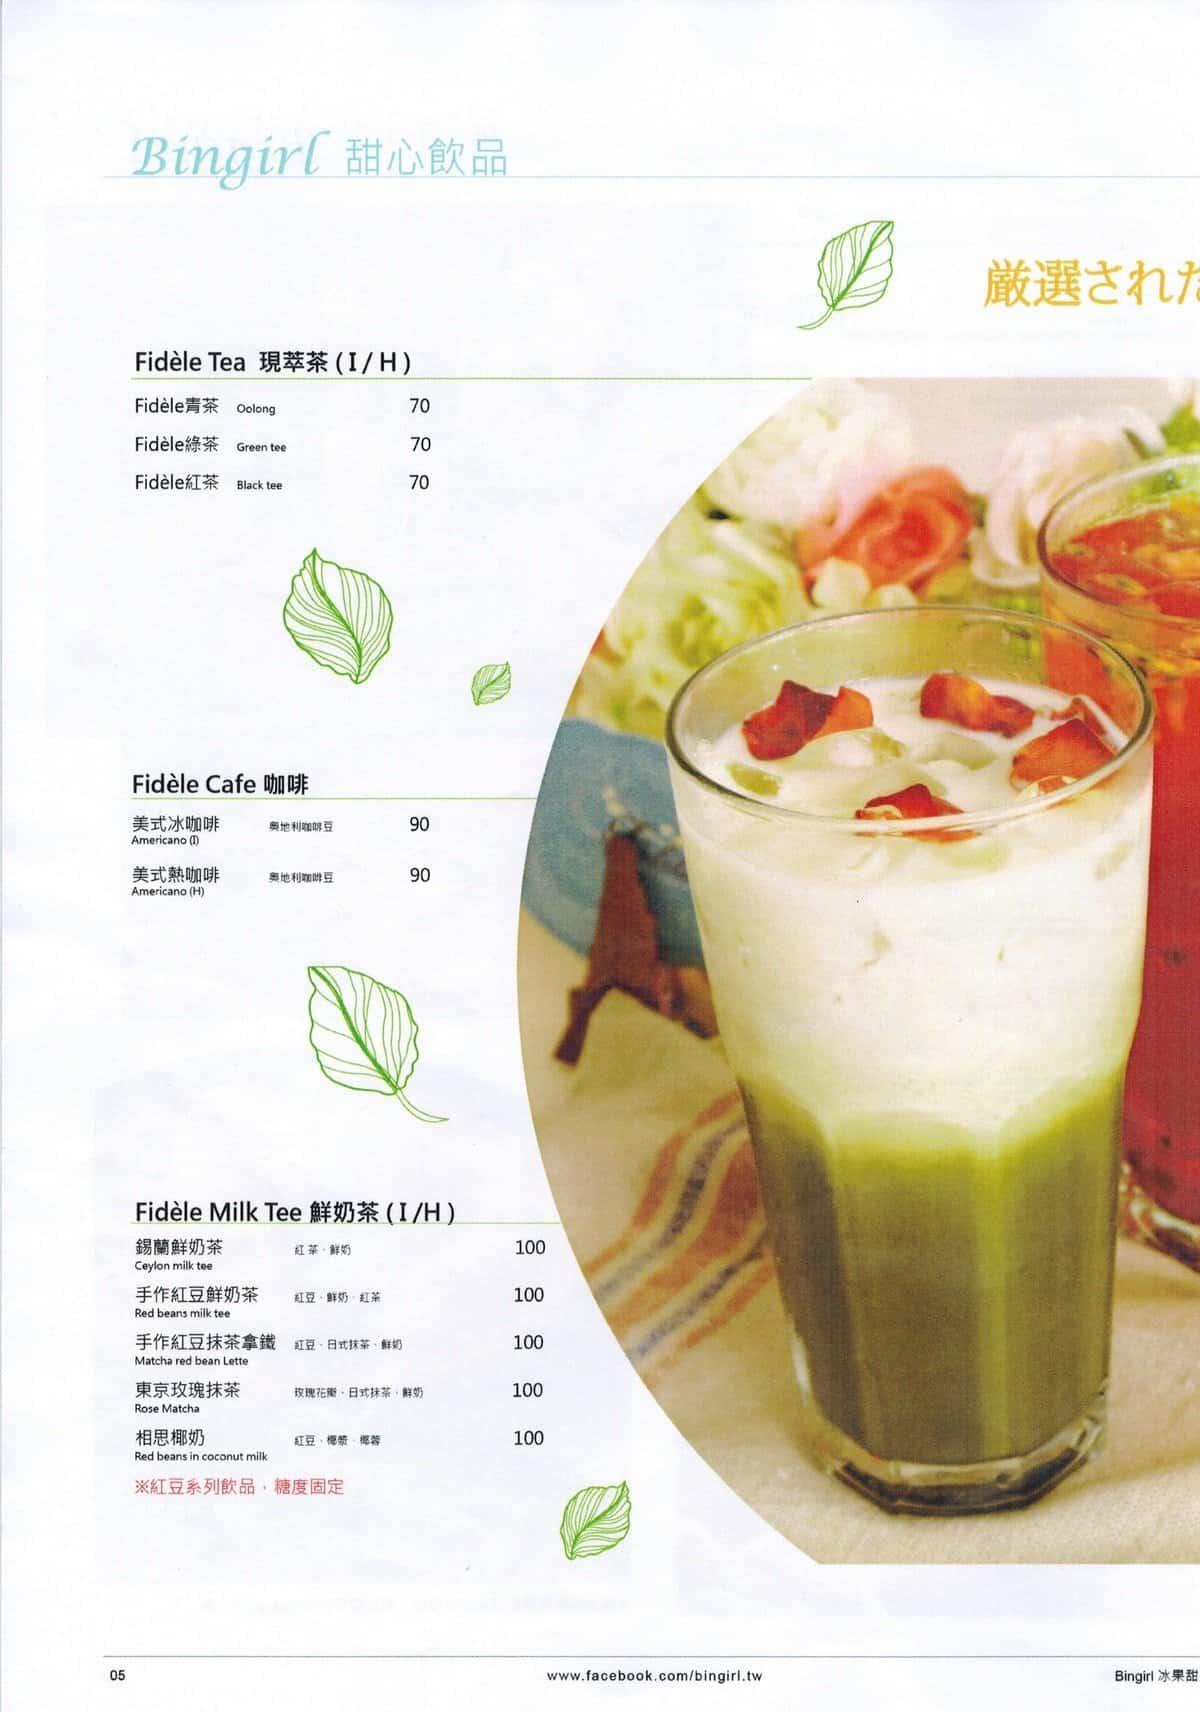 taipei-bingirl-menu6